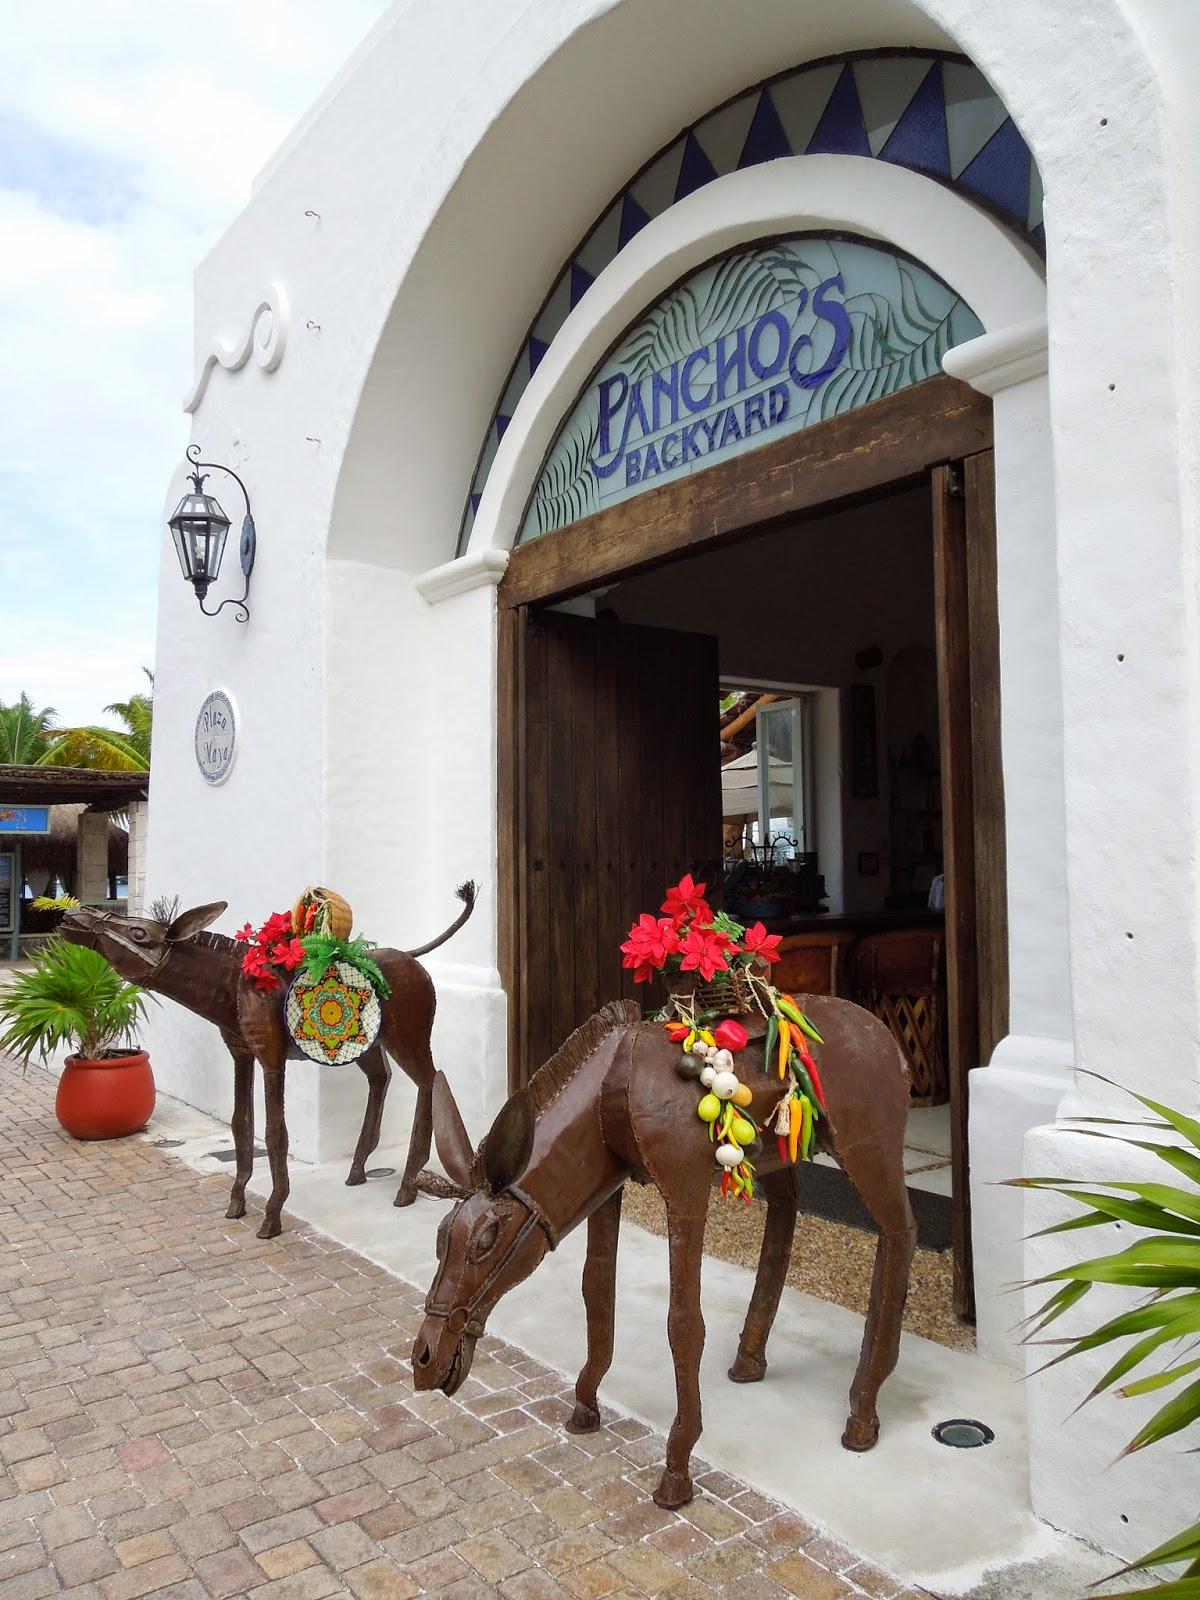 Poncho's Backyard Puerta Maya